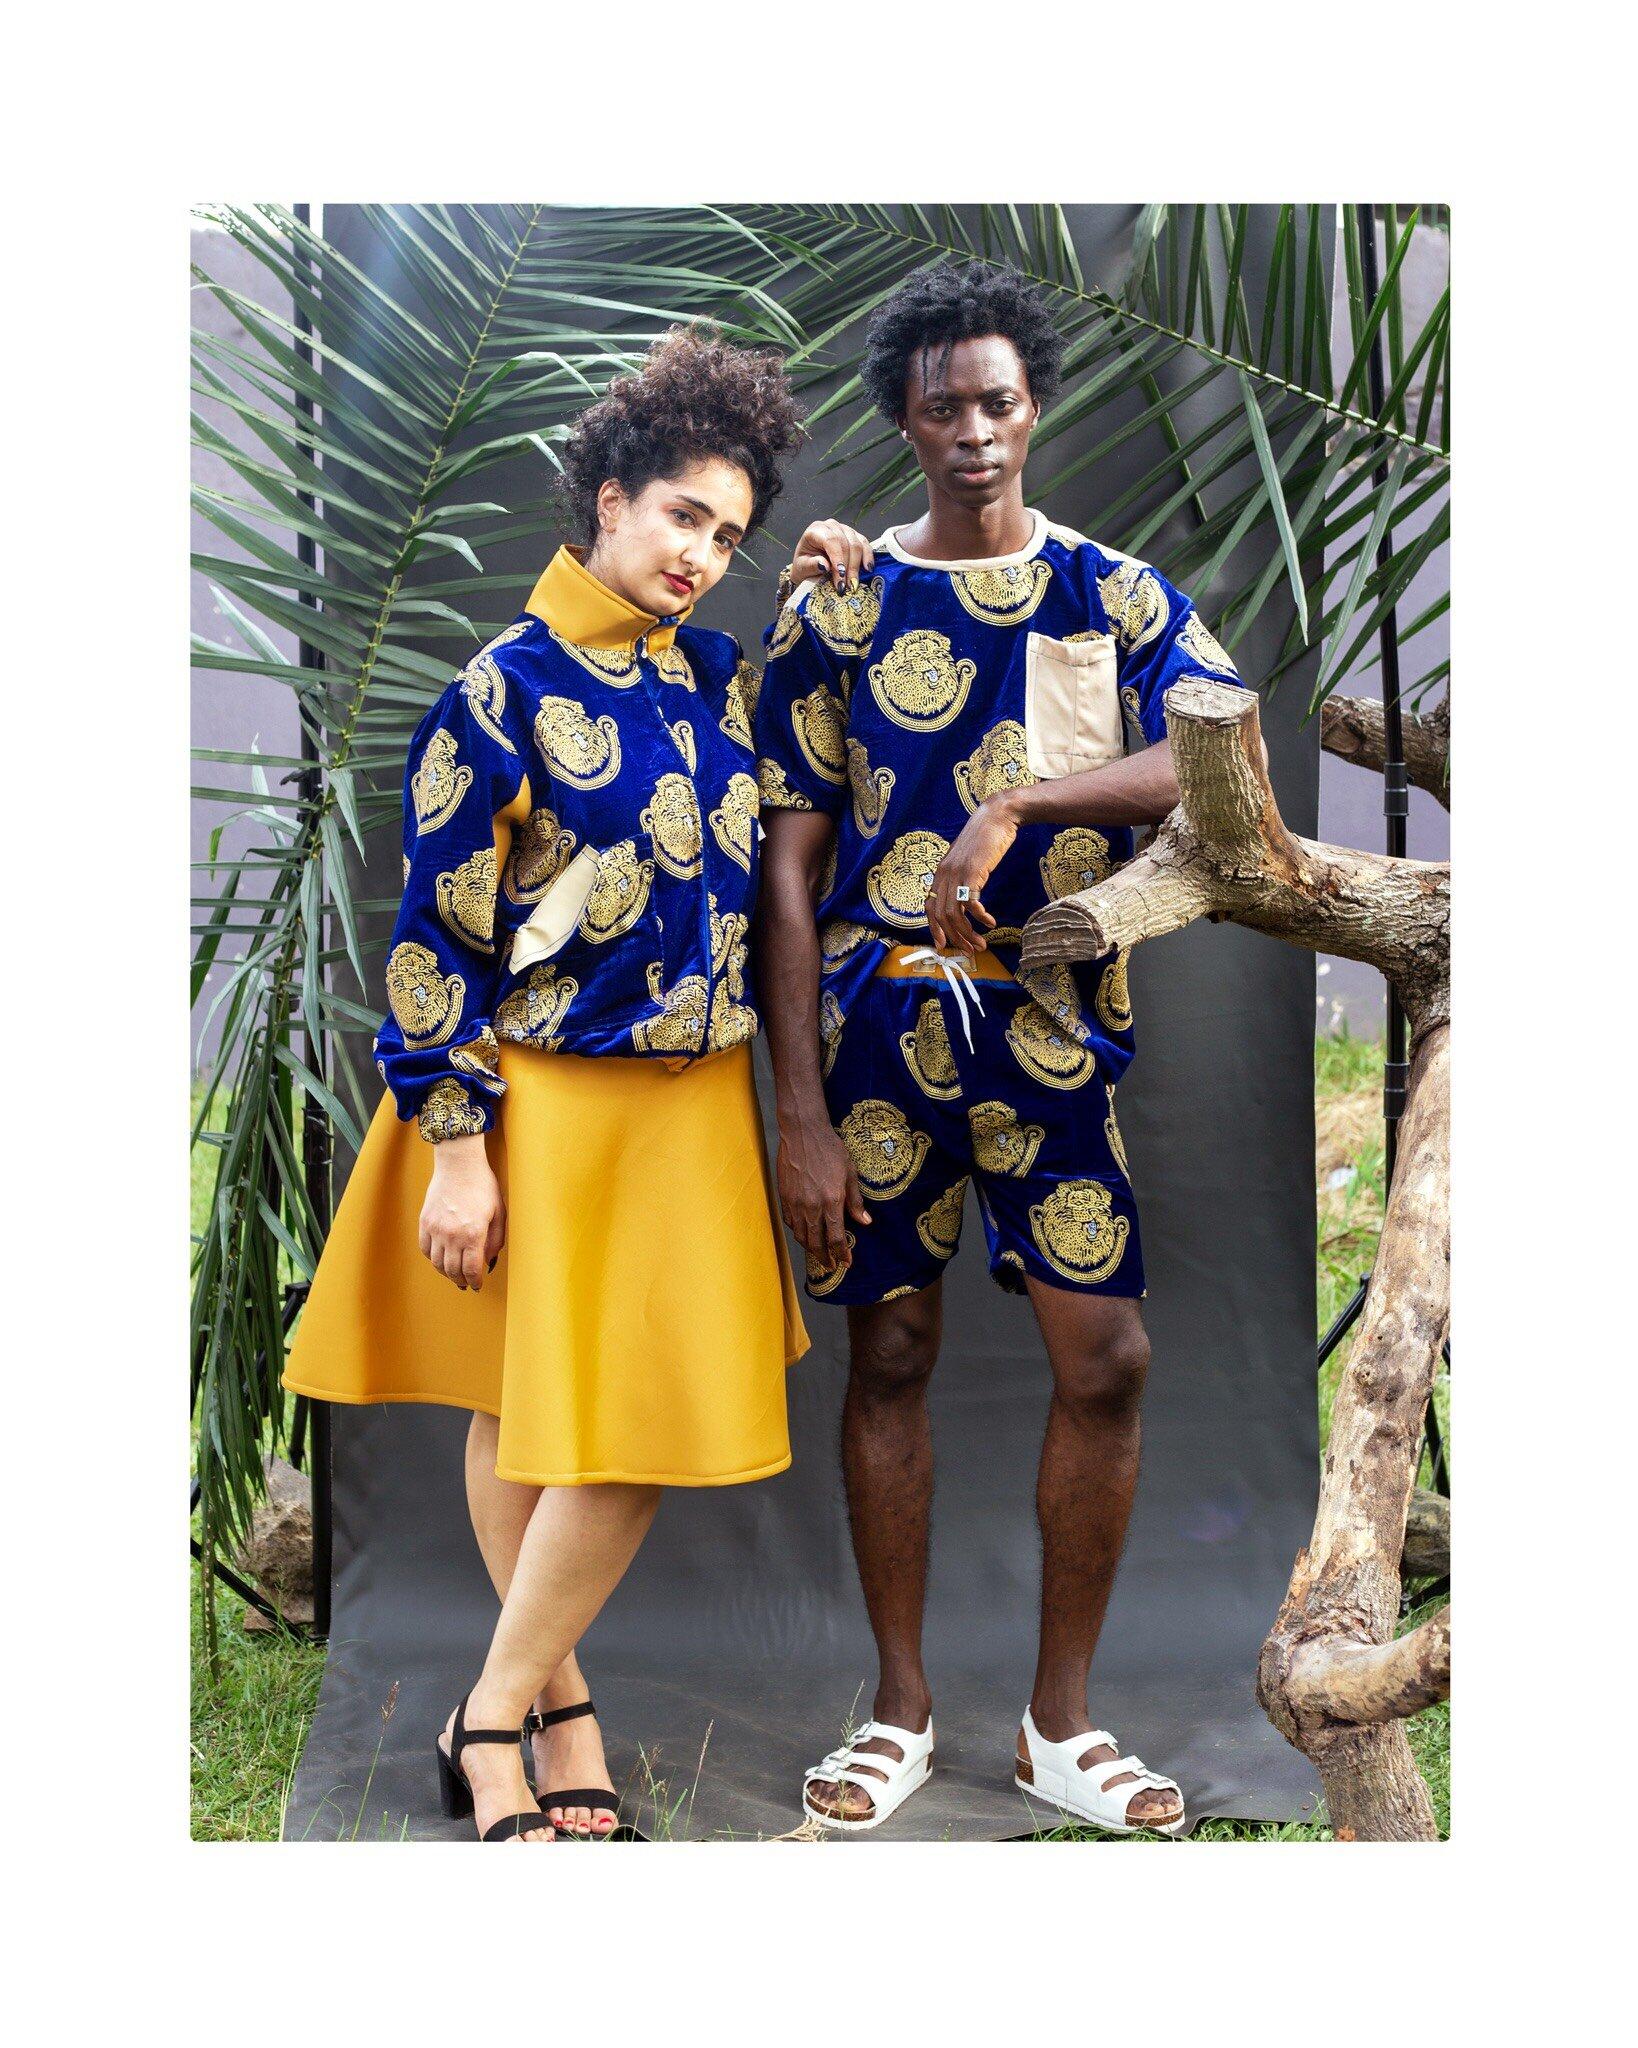 Citizens Casual - Fashion Show: 4 SeasonsUrban Fashion BrandCountry of origin/country represented: Ghana